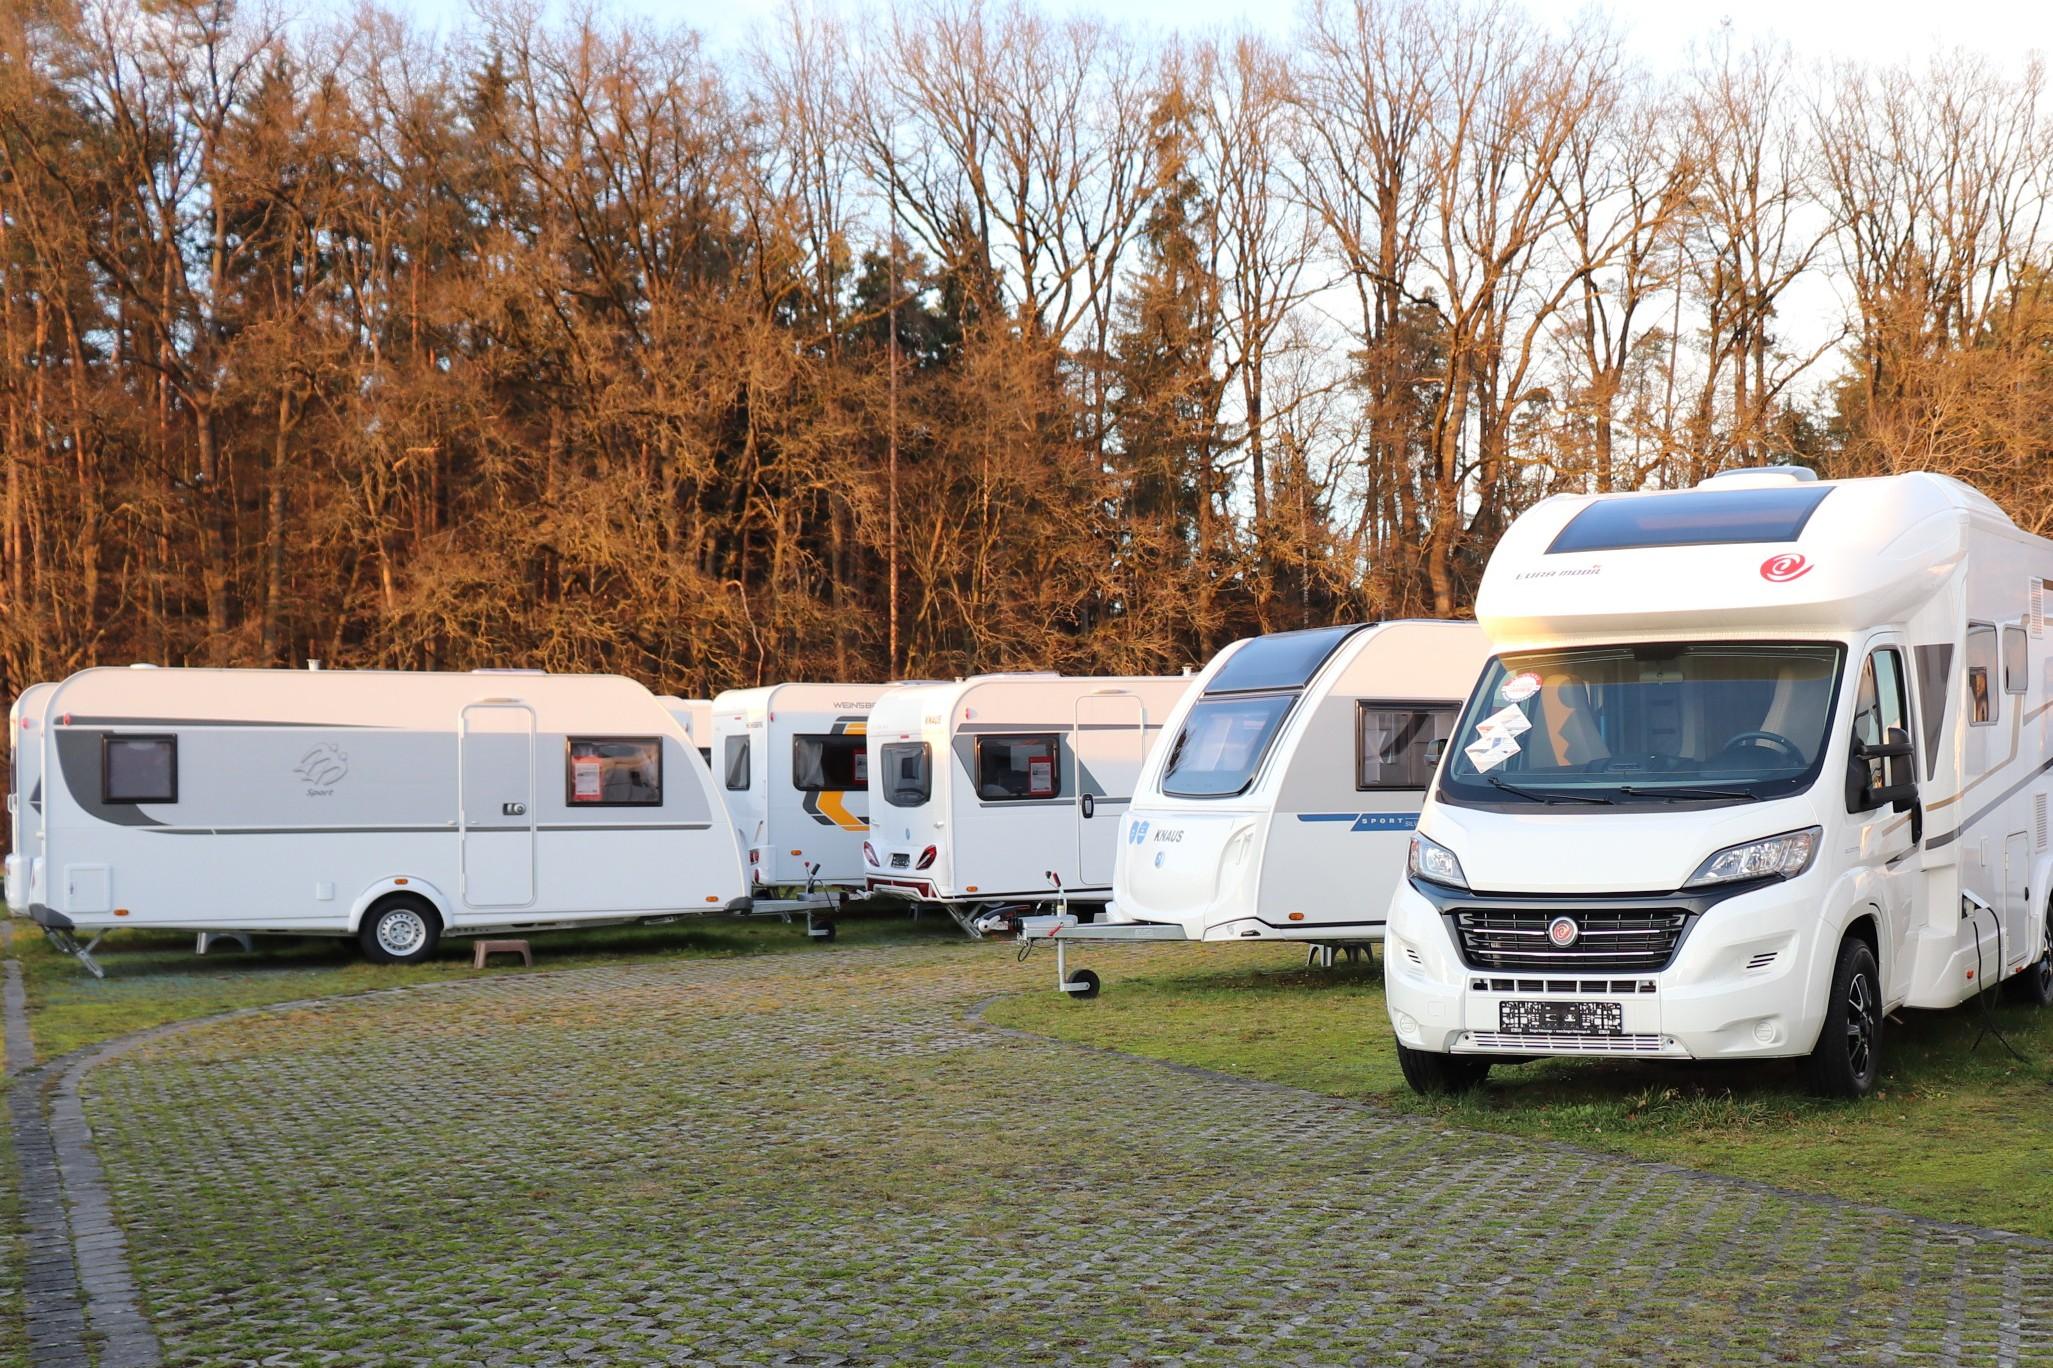 Wohnmobil / Wohnwagen kaufen oder mieten?  Berger Blog - Berger Blog